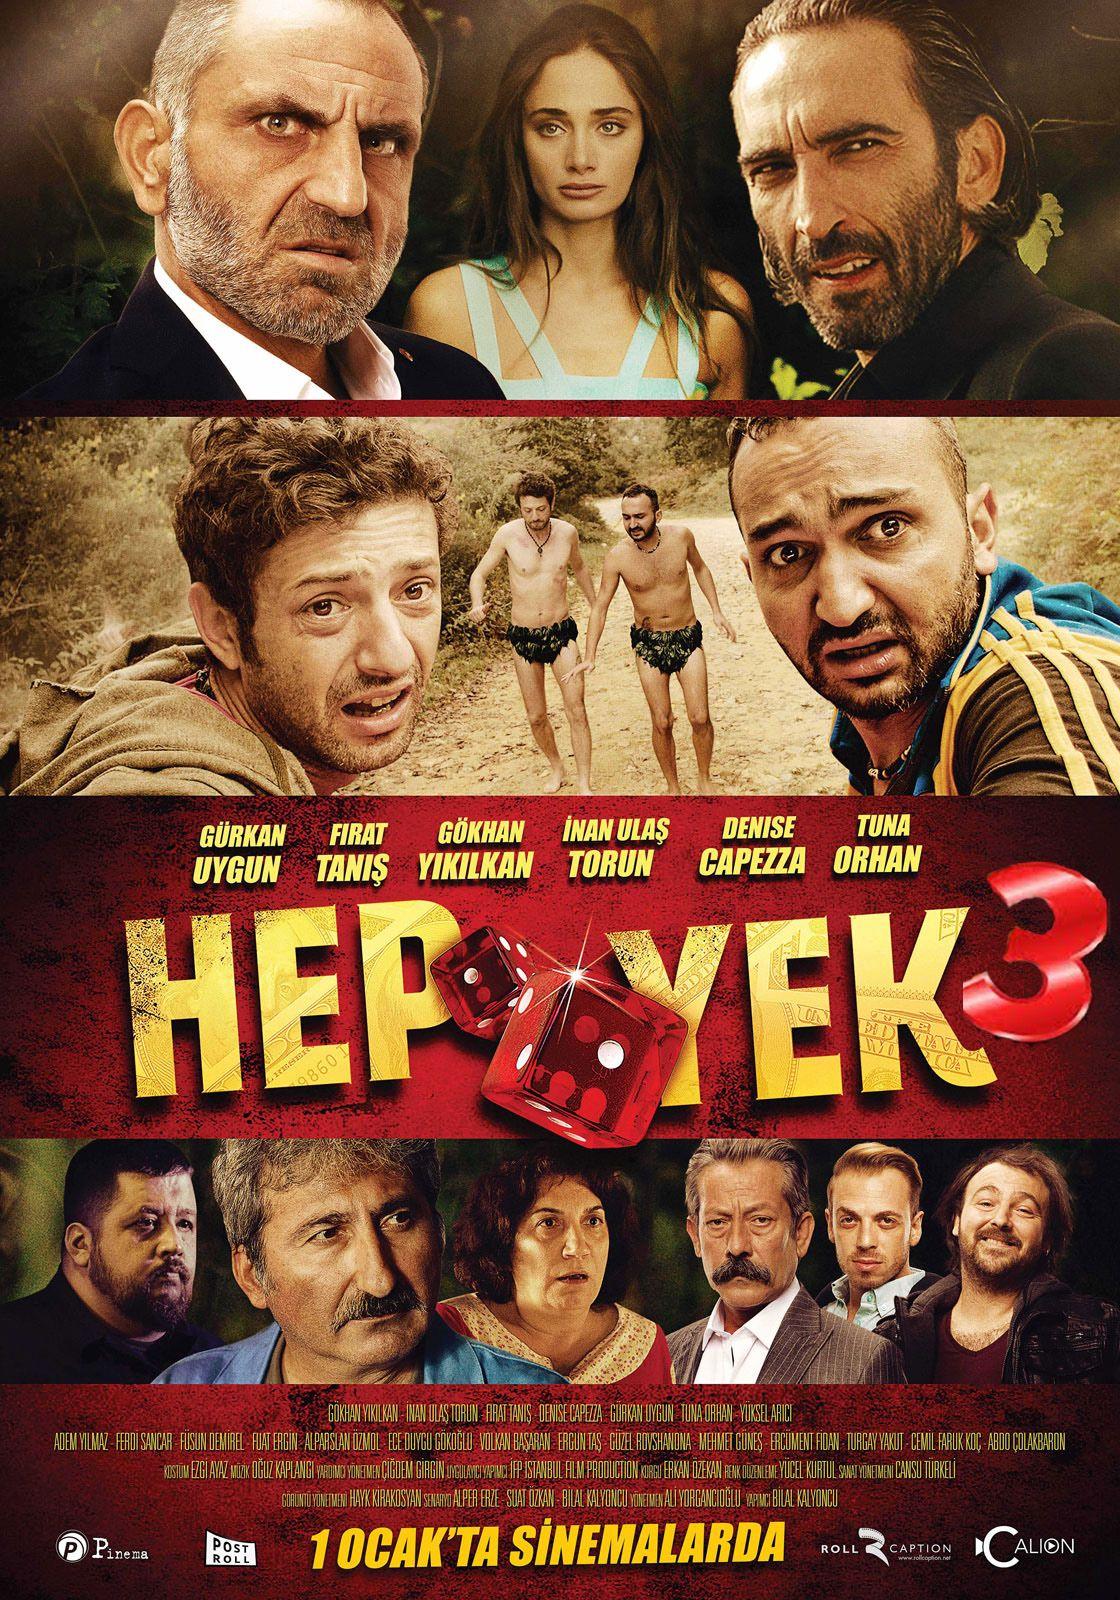 HEP YEK-3